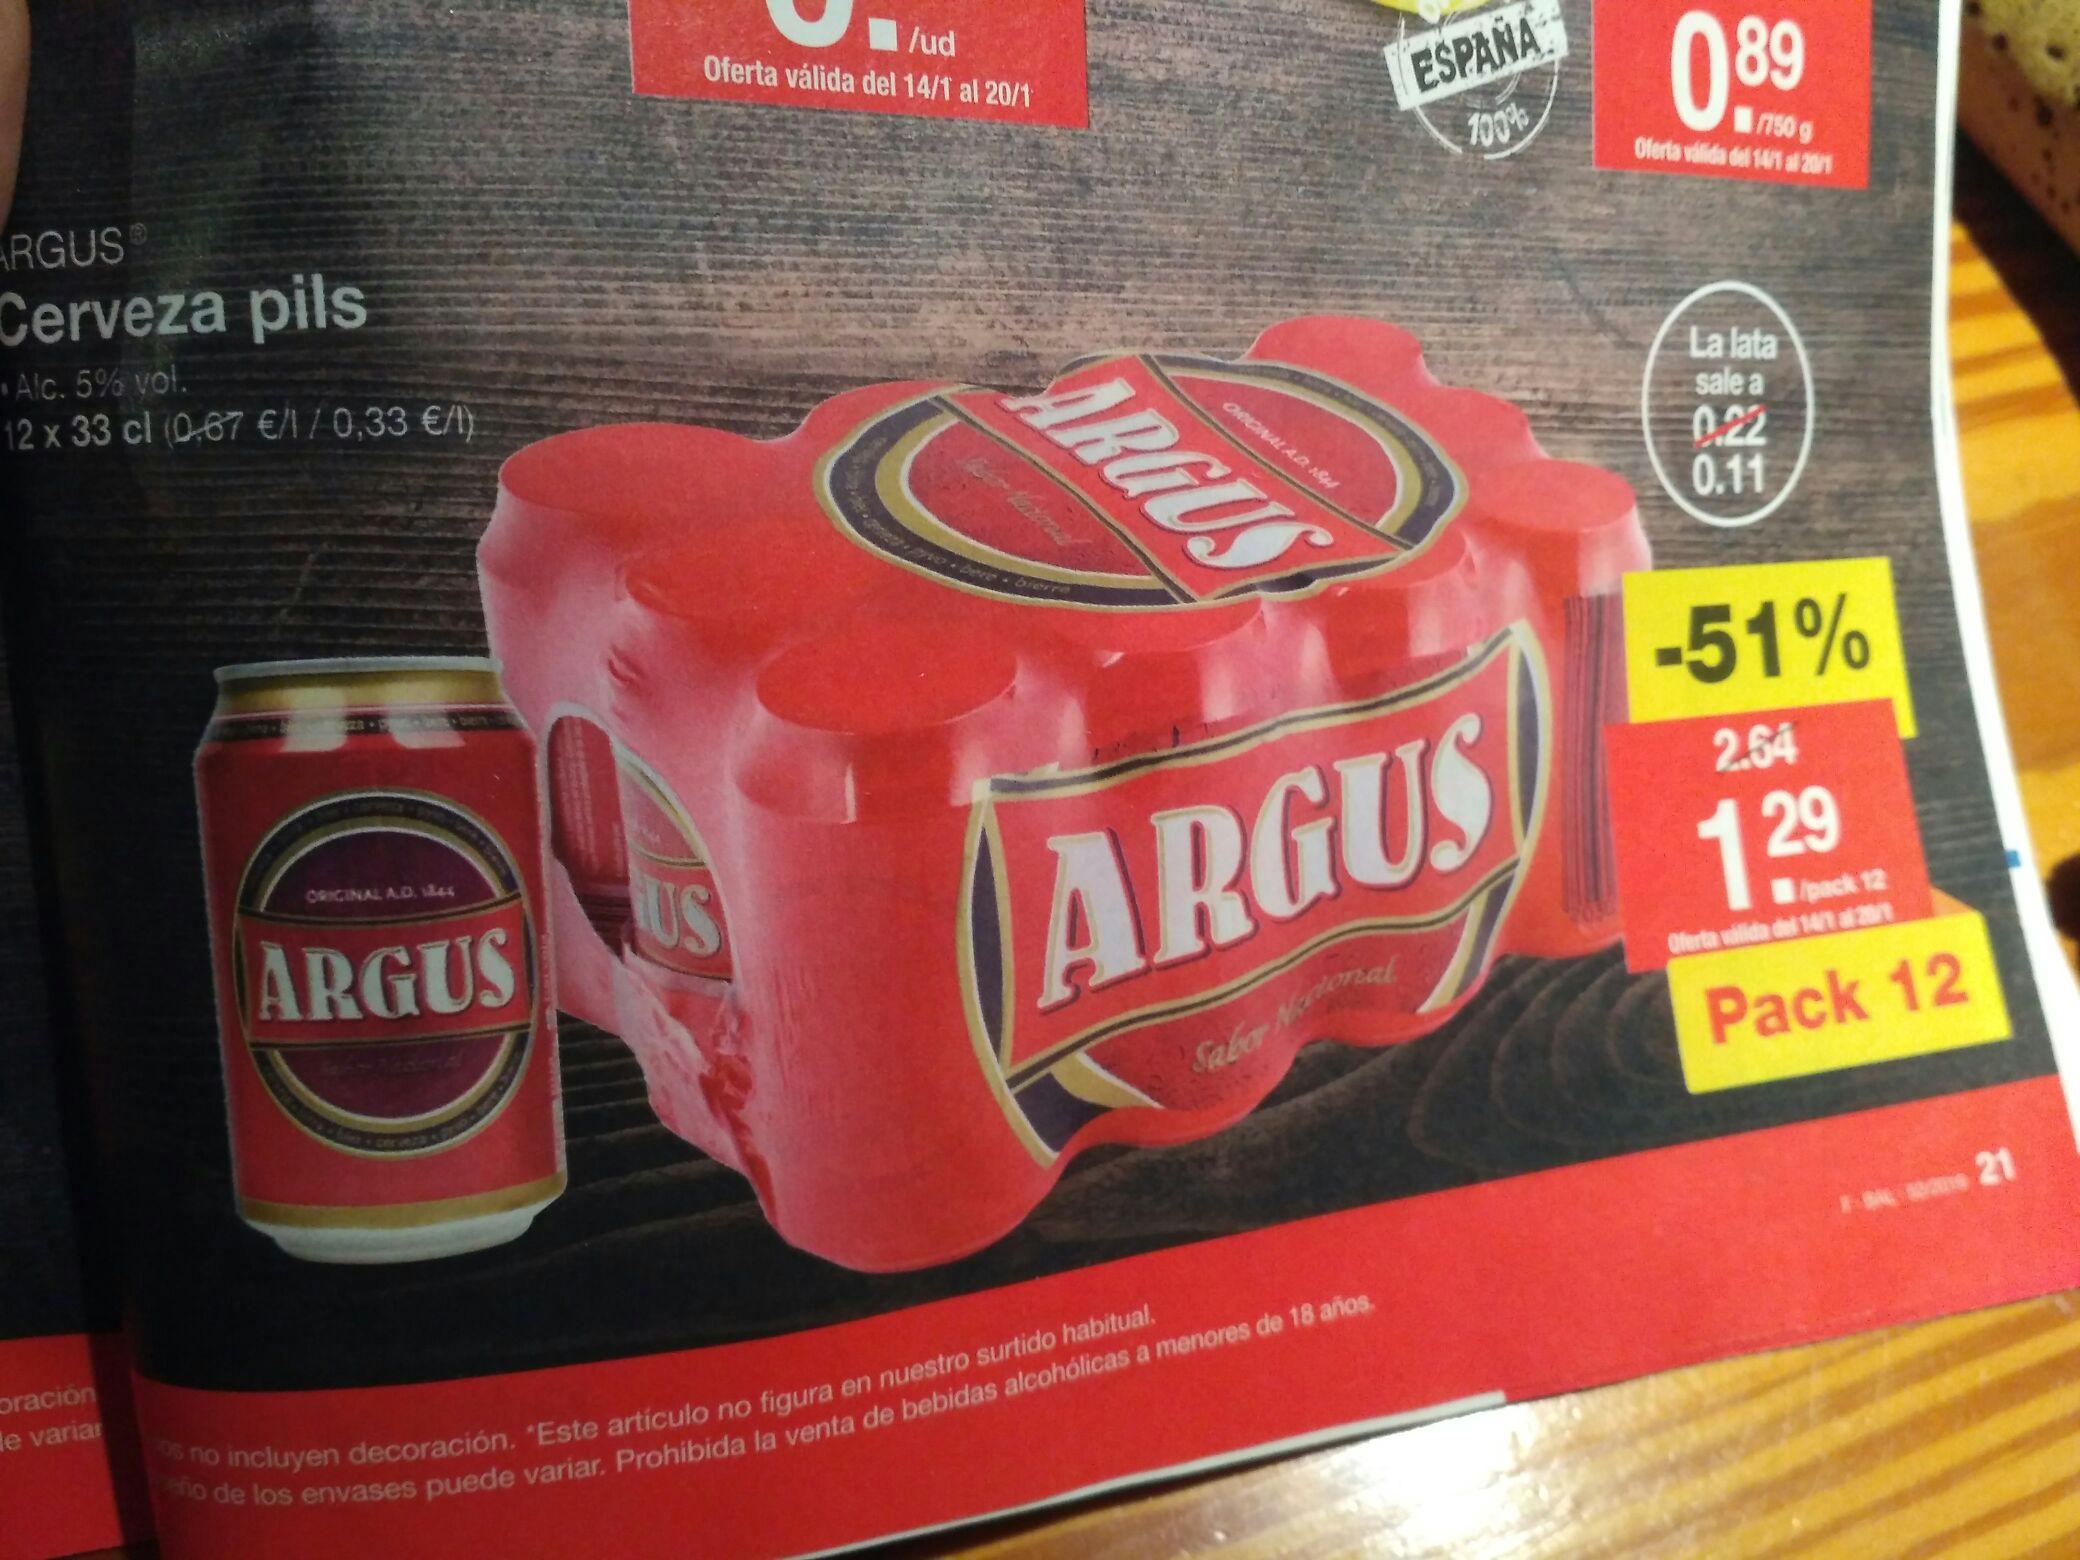 ¡¡¡Super oferta de cerveza Argus!!!